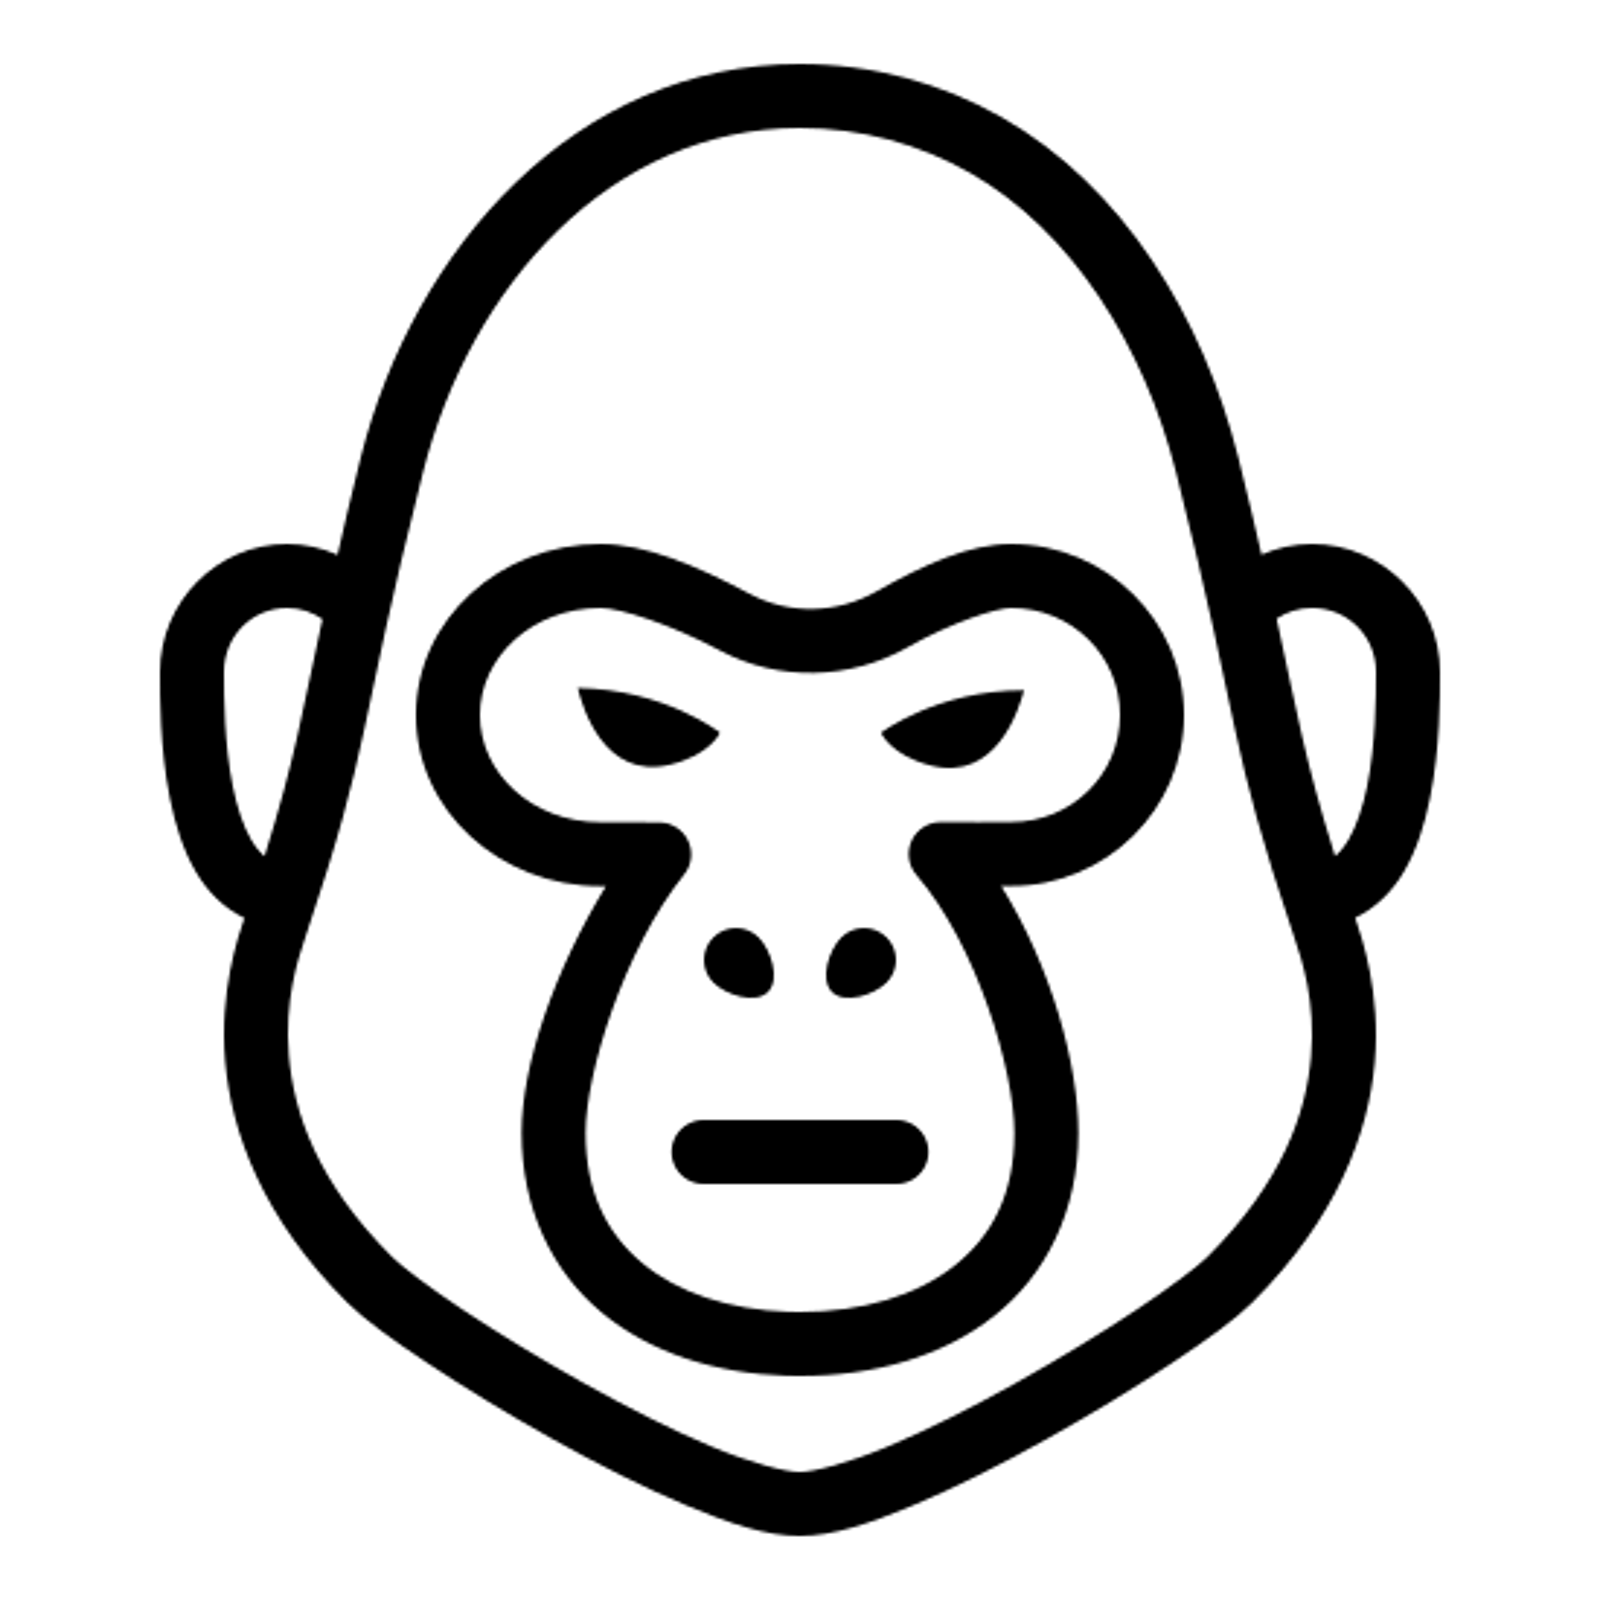 Harambe the Gorilla icon